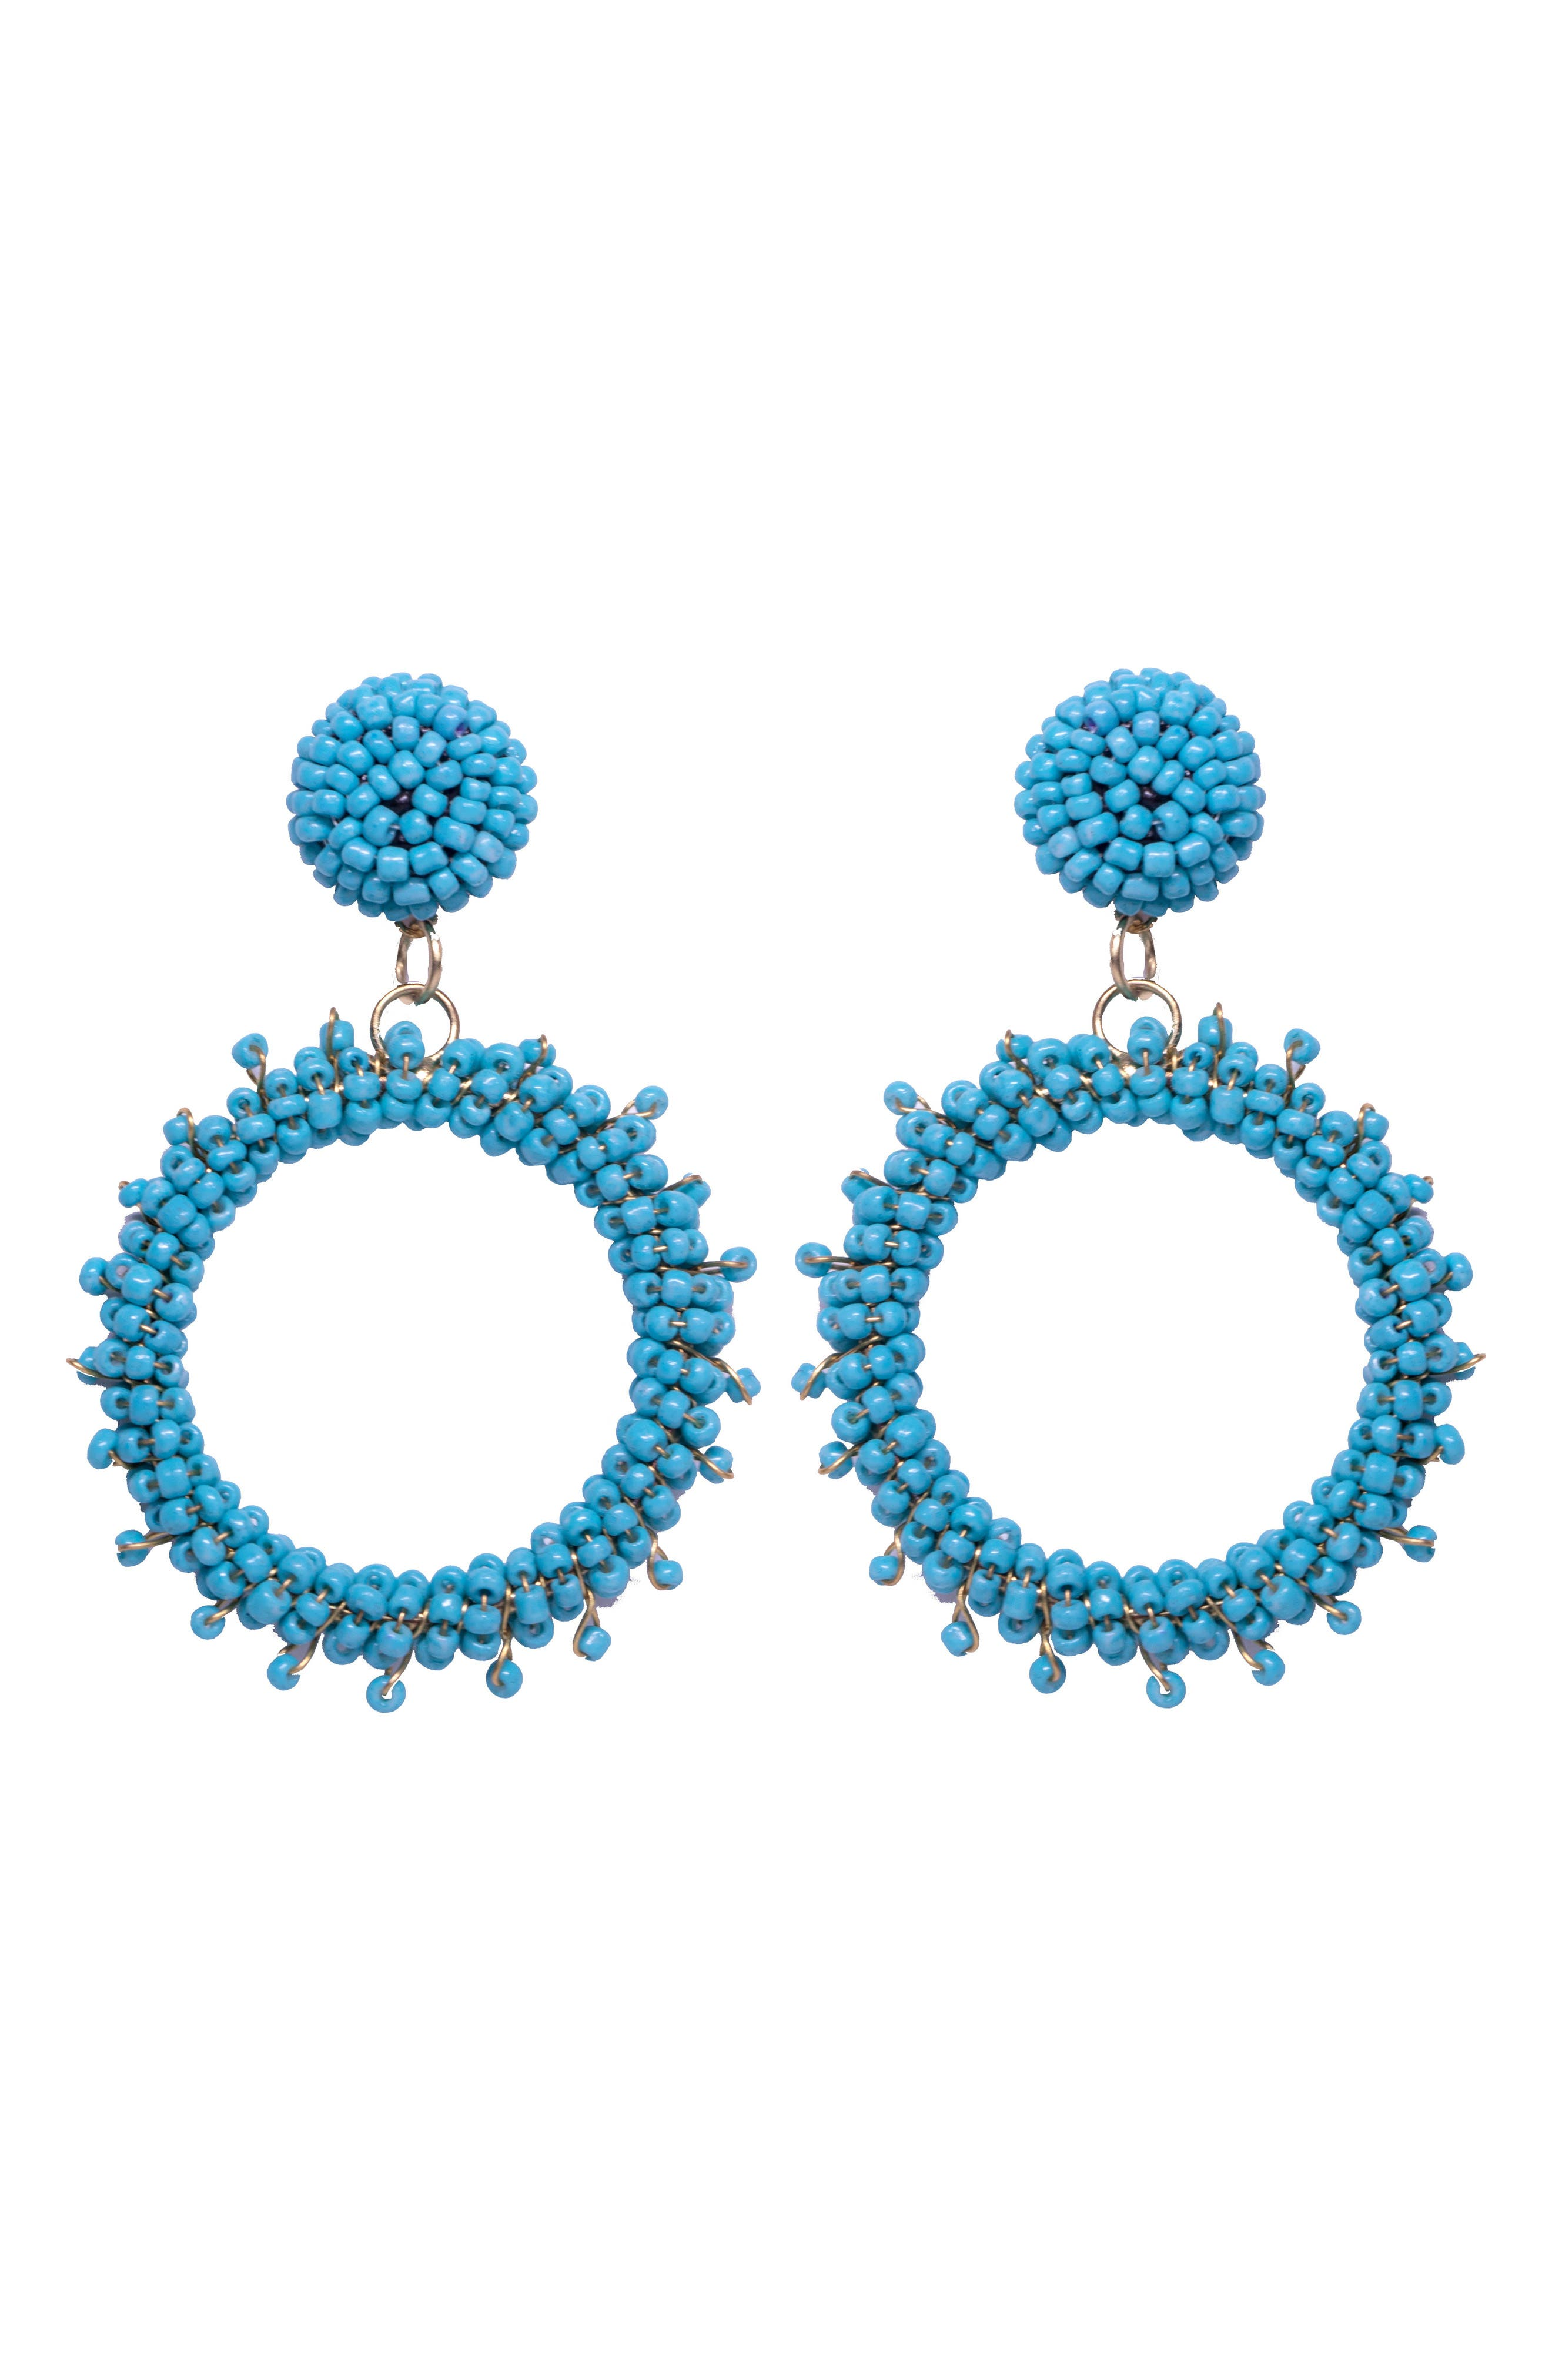 Marie Drop Earrings,                             Main thumbnail 1, color,                             Turquoise